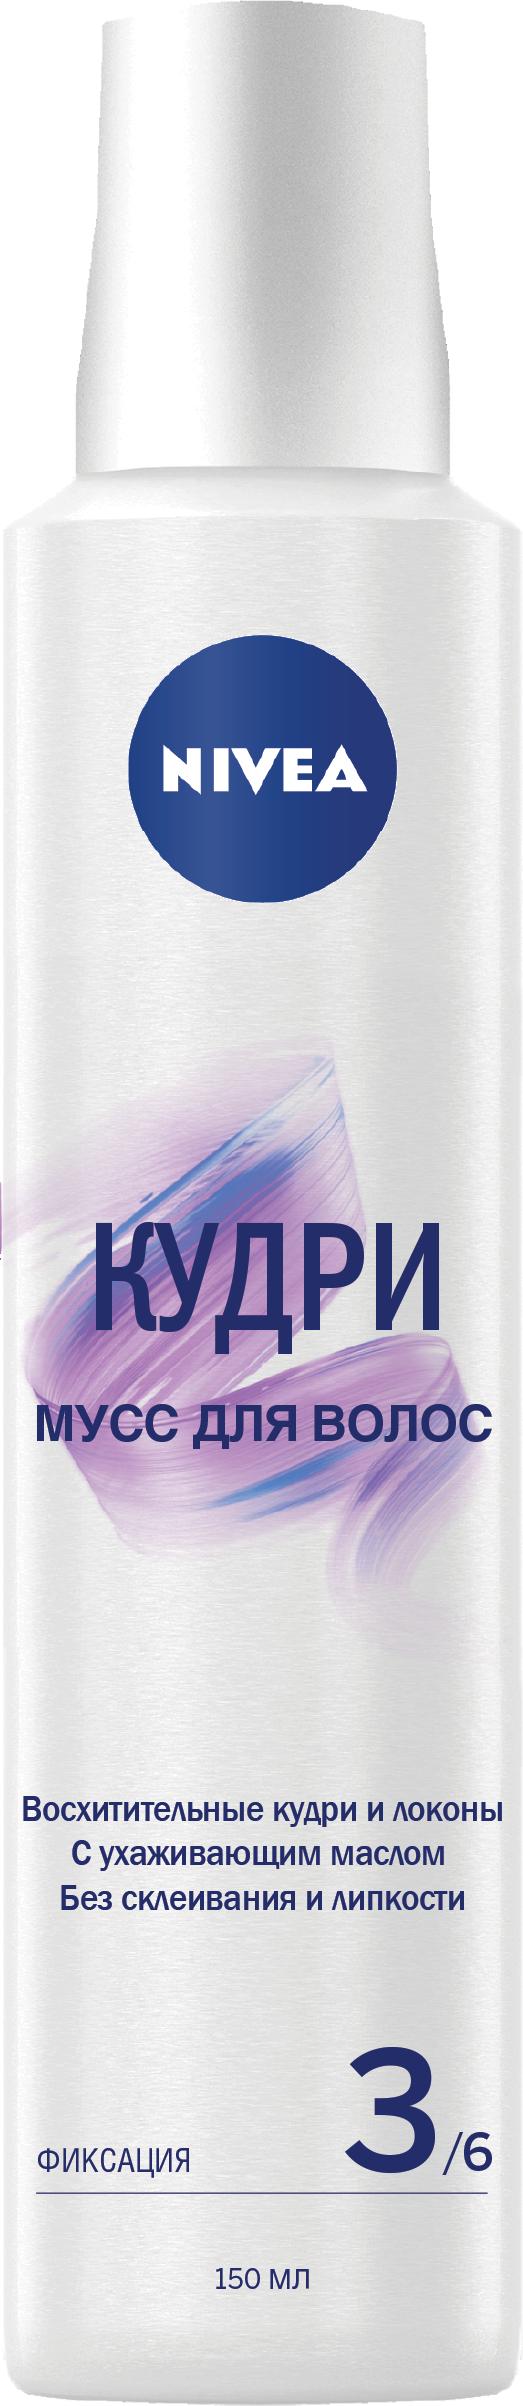 Мусс для укладки волос NIVEA КУДРИ 88664